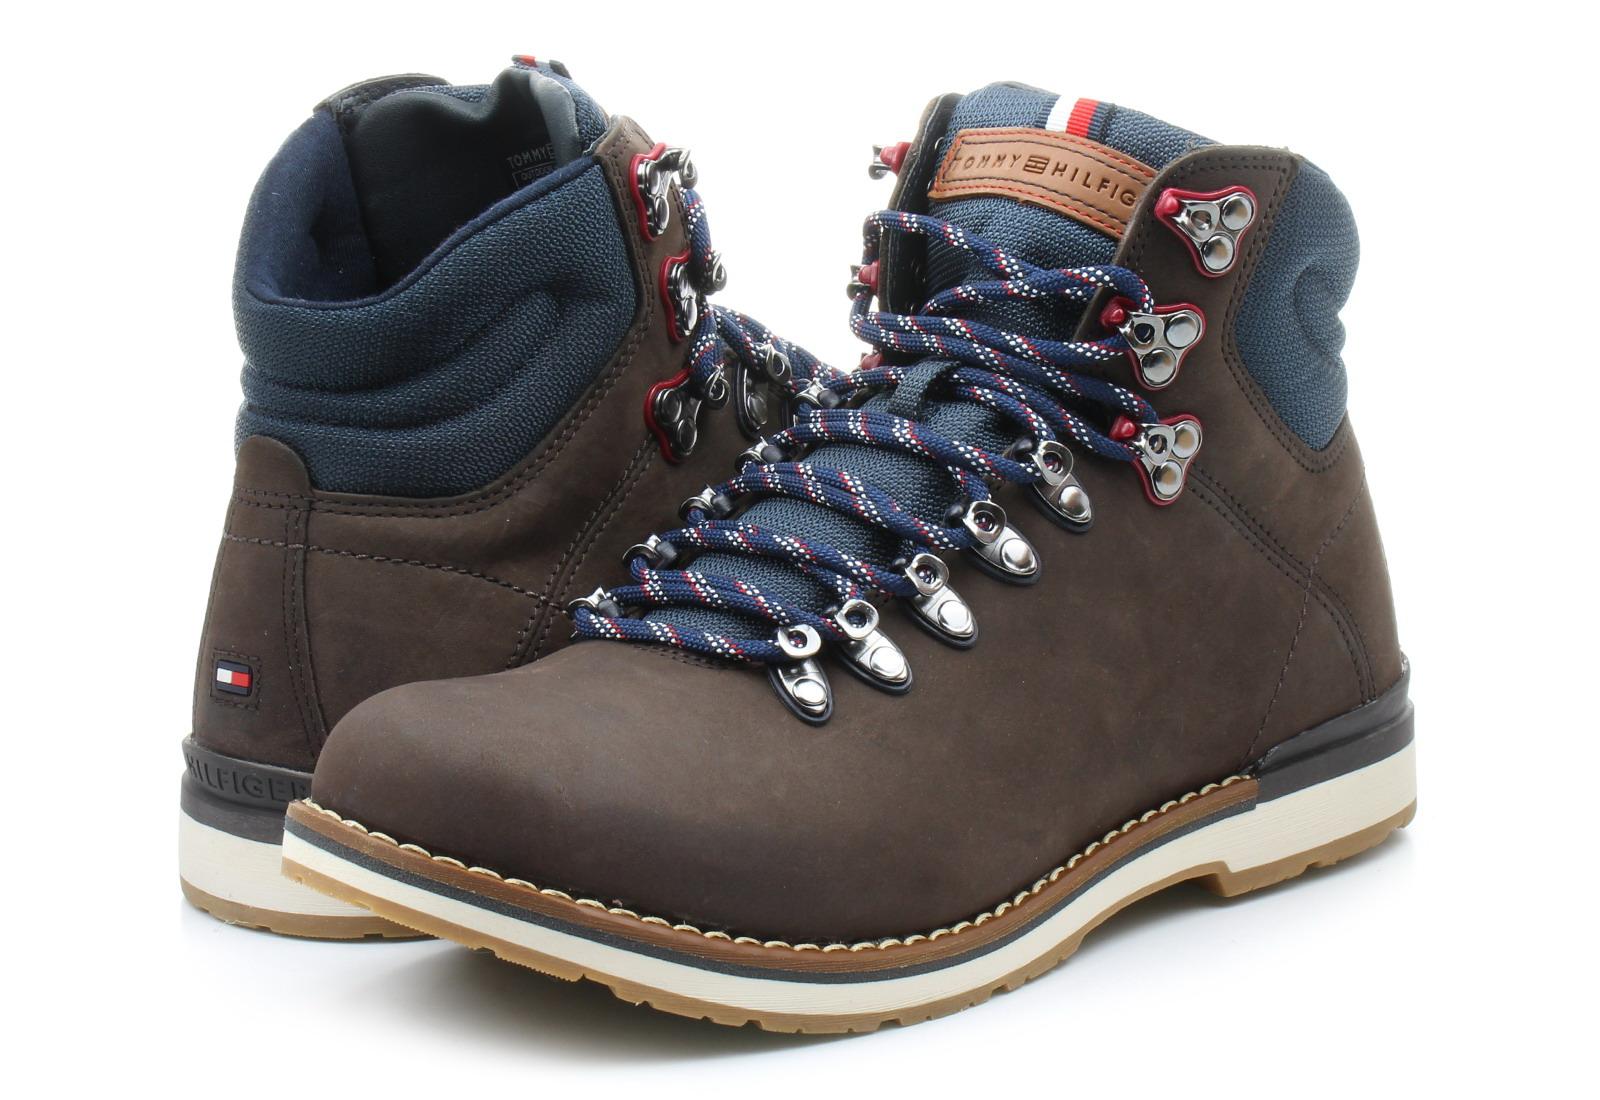 Tommy Hilfiger Bakancs - Rover 4c - 18F-1755-211 - Office Shoes ... 5e0ed31b56